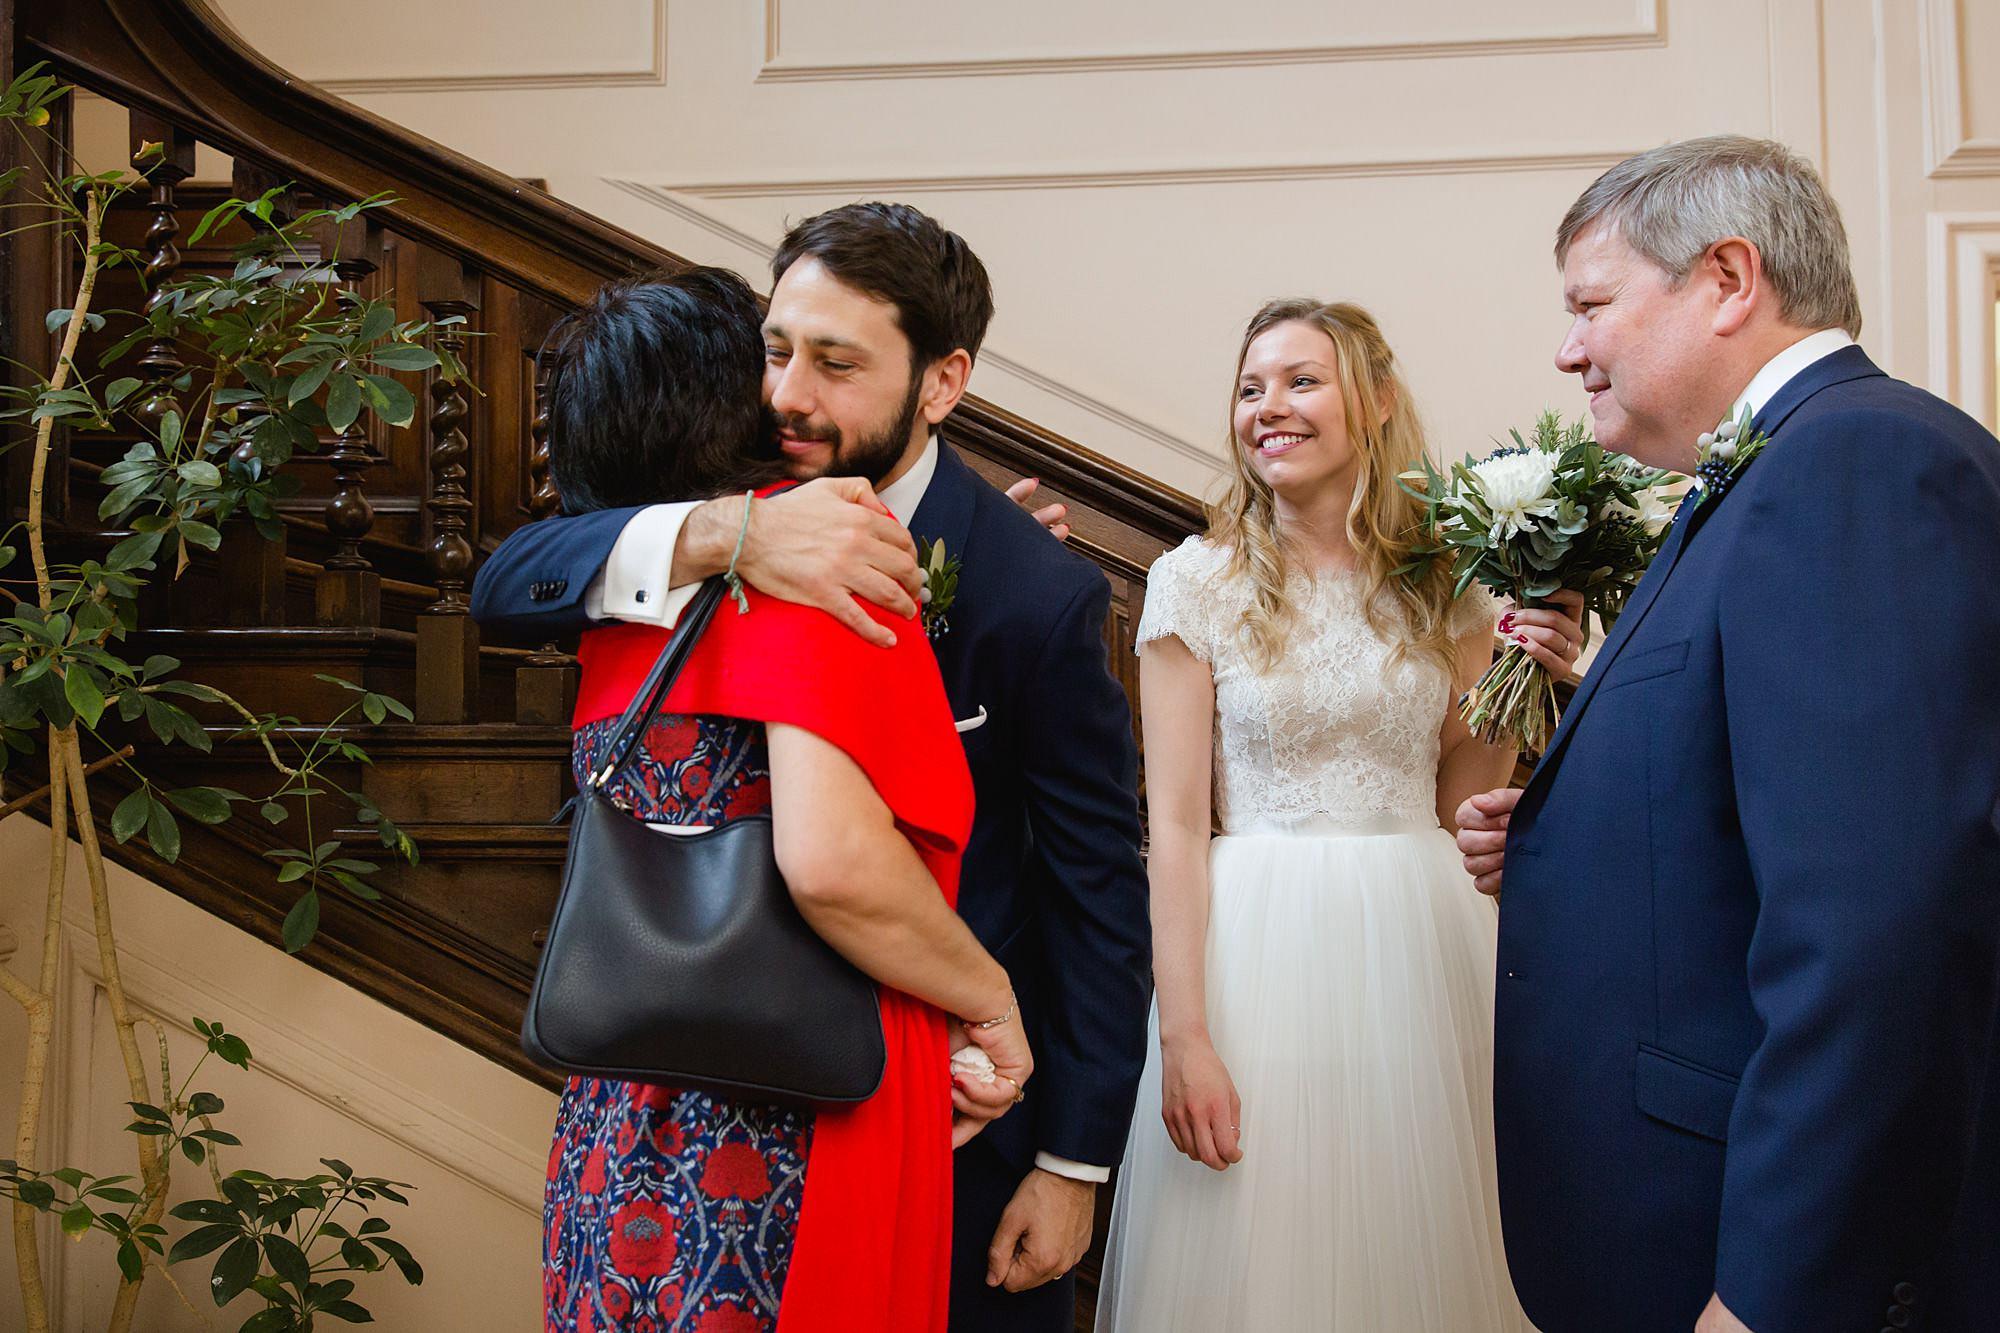 shaw house wedding groom hugs guest